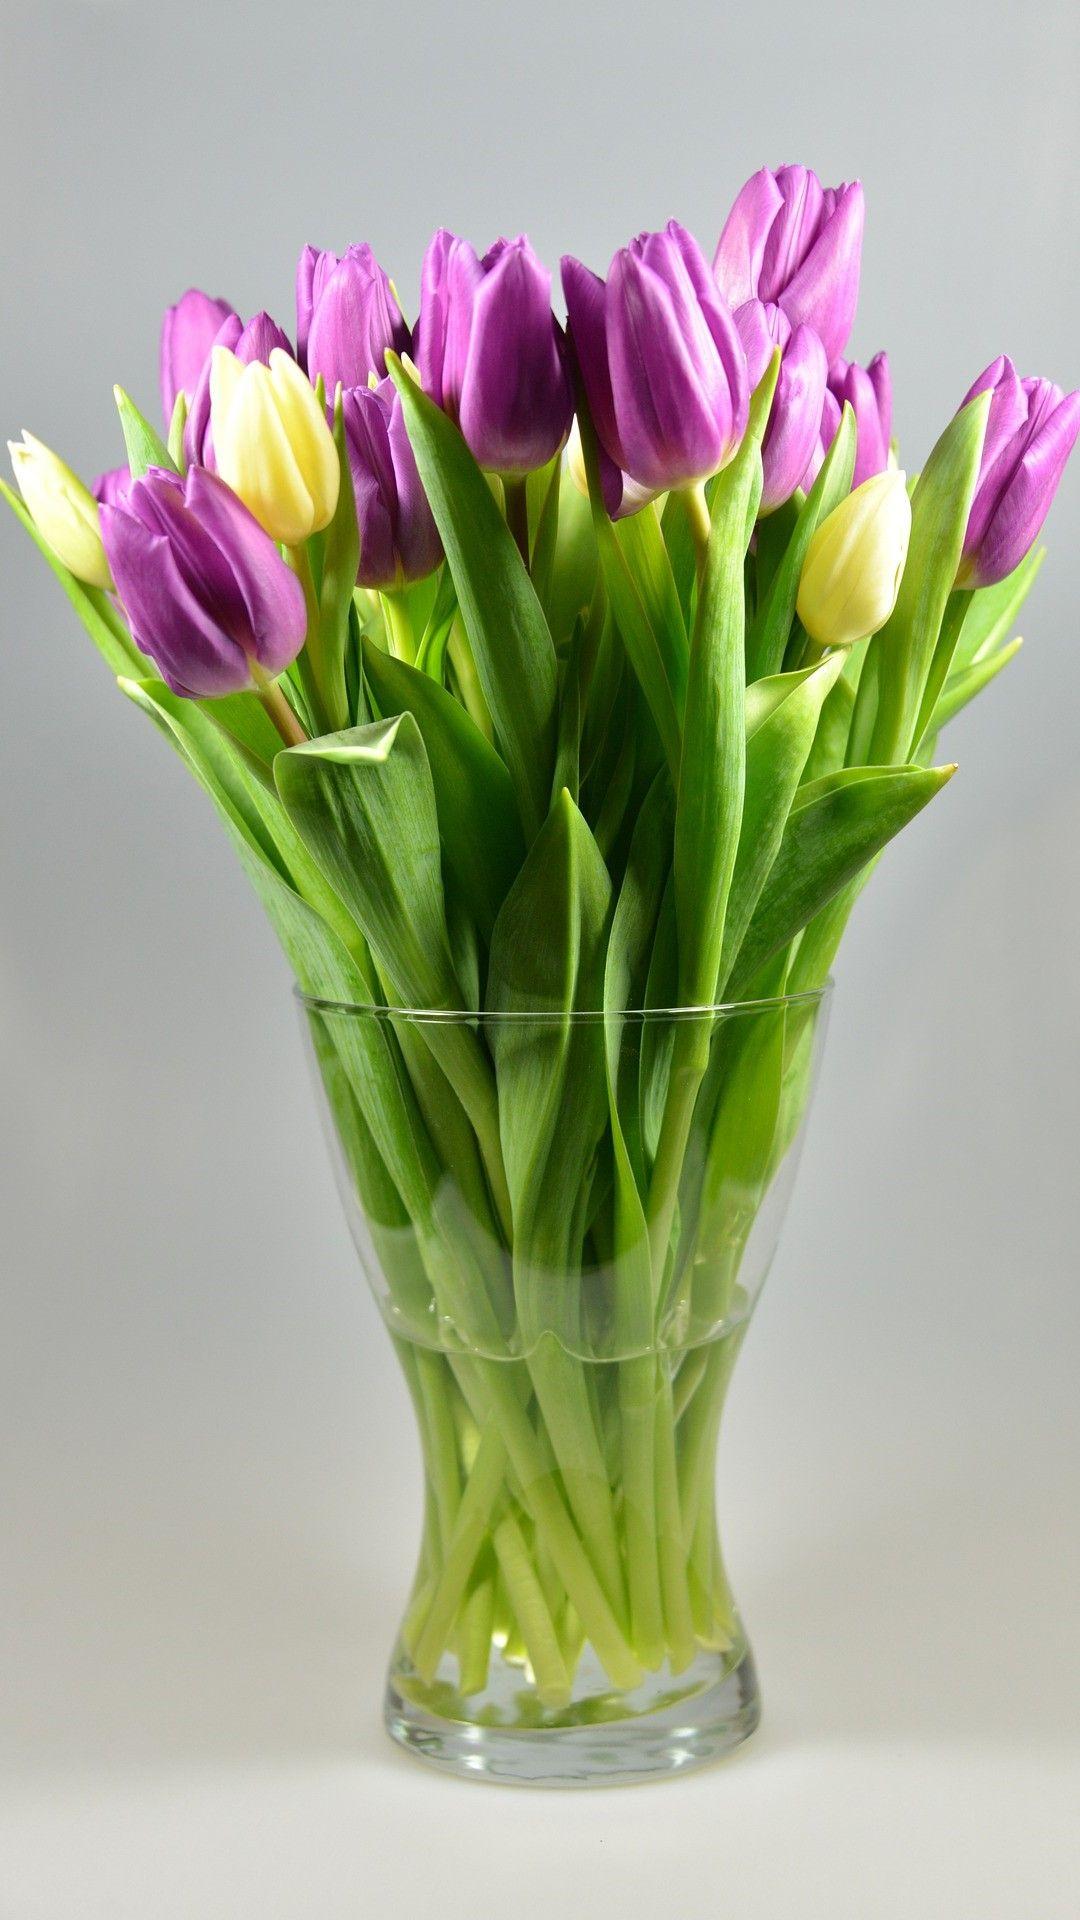 15 Flower Delivery Near Me Options Flowersandflowerthings Flower Vases Birthday Flowers Bouquet Flower Arrangements